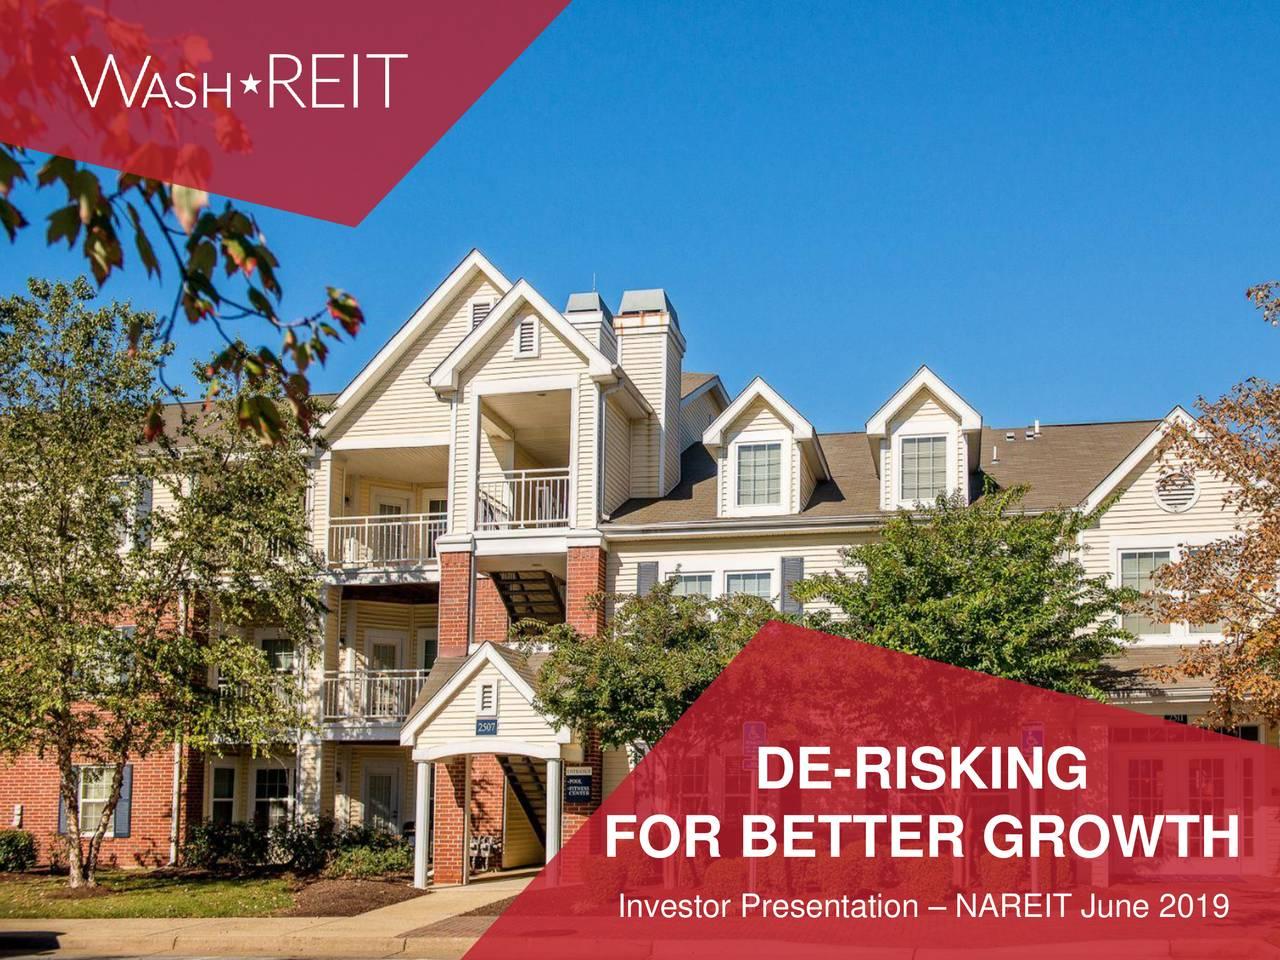 Washington Real Estate Investment Trust (WRE) Presents At NAREIT 2019 Investor Conference - Slideshow